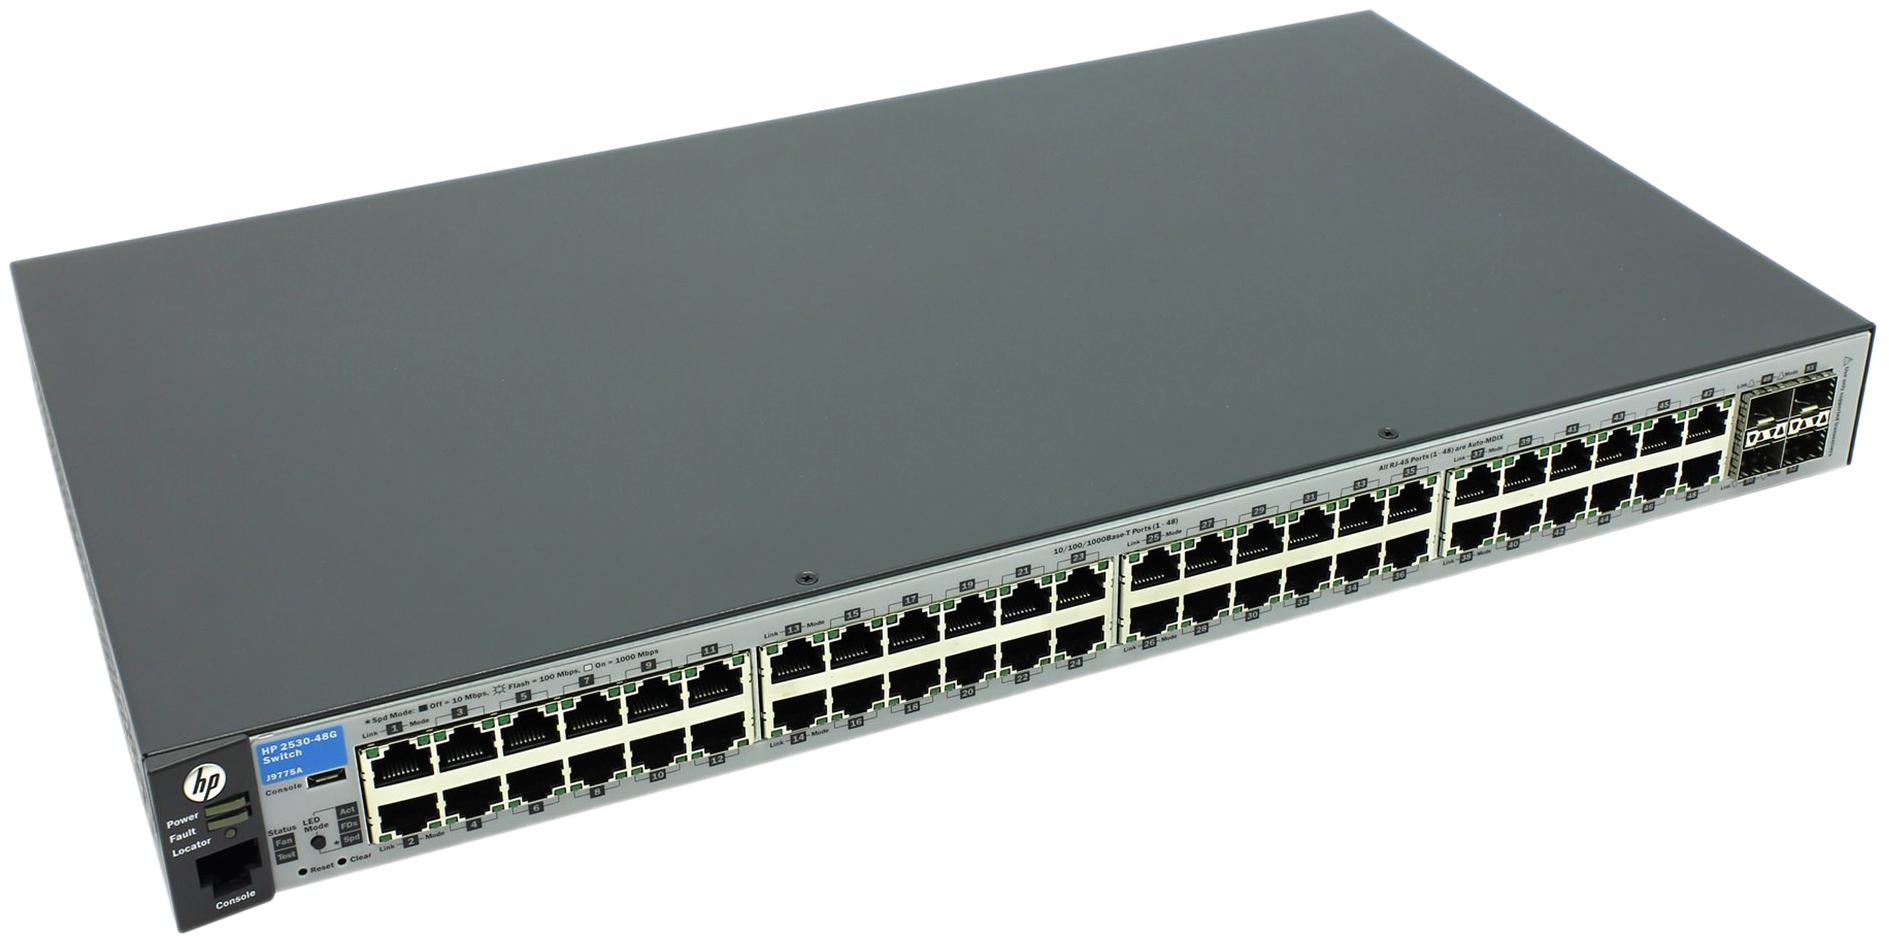 Коммутатор HP Aruba 2530 48G J9775A Grey/Black